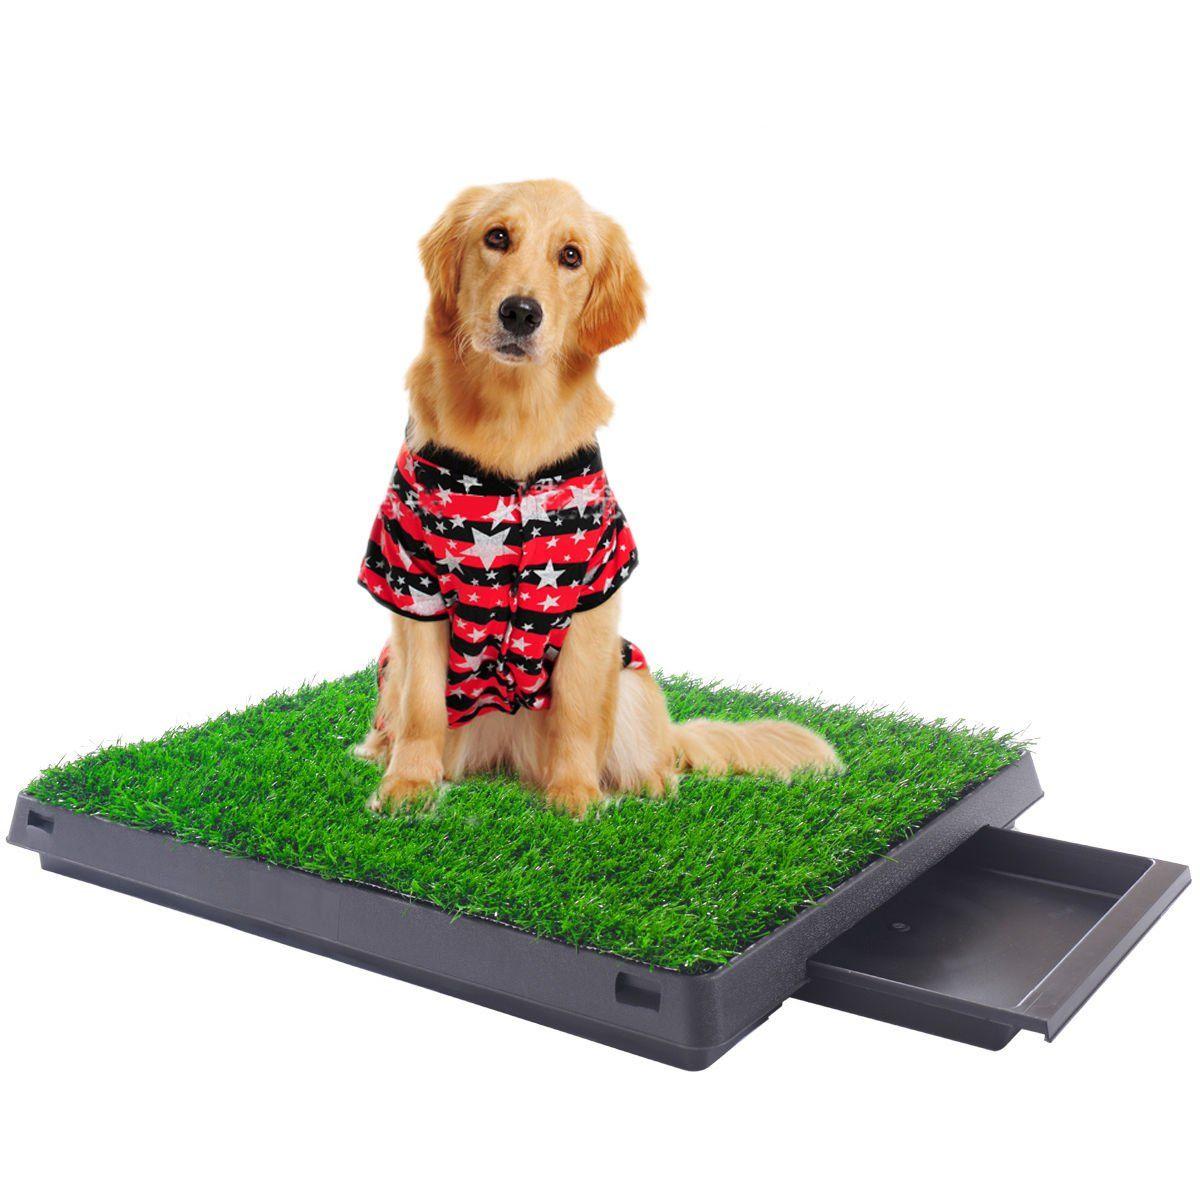 Indoor Puppy Dog Pet Potty Training